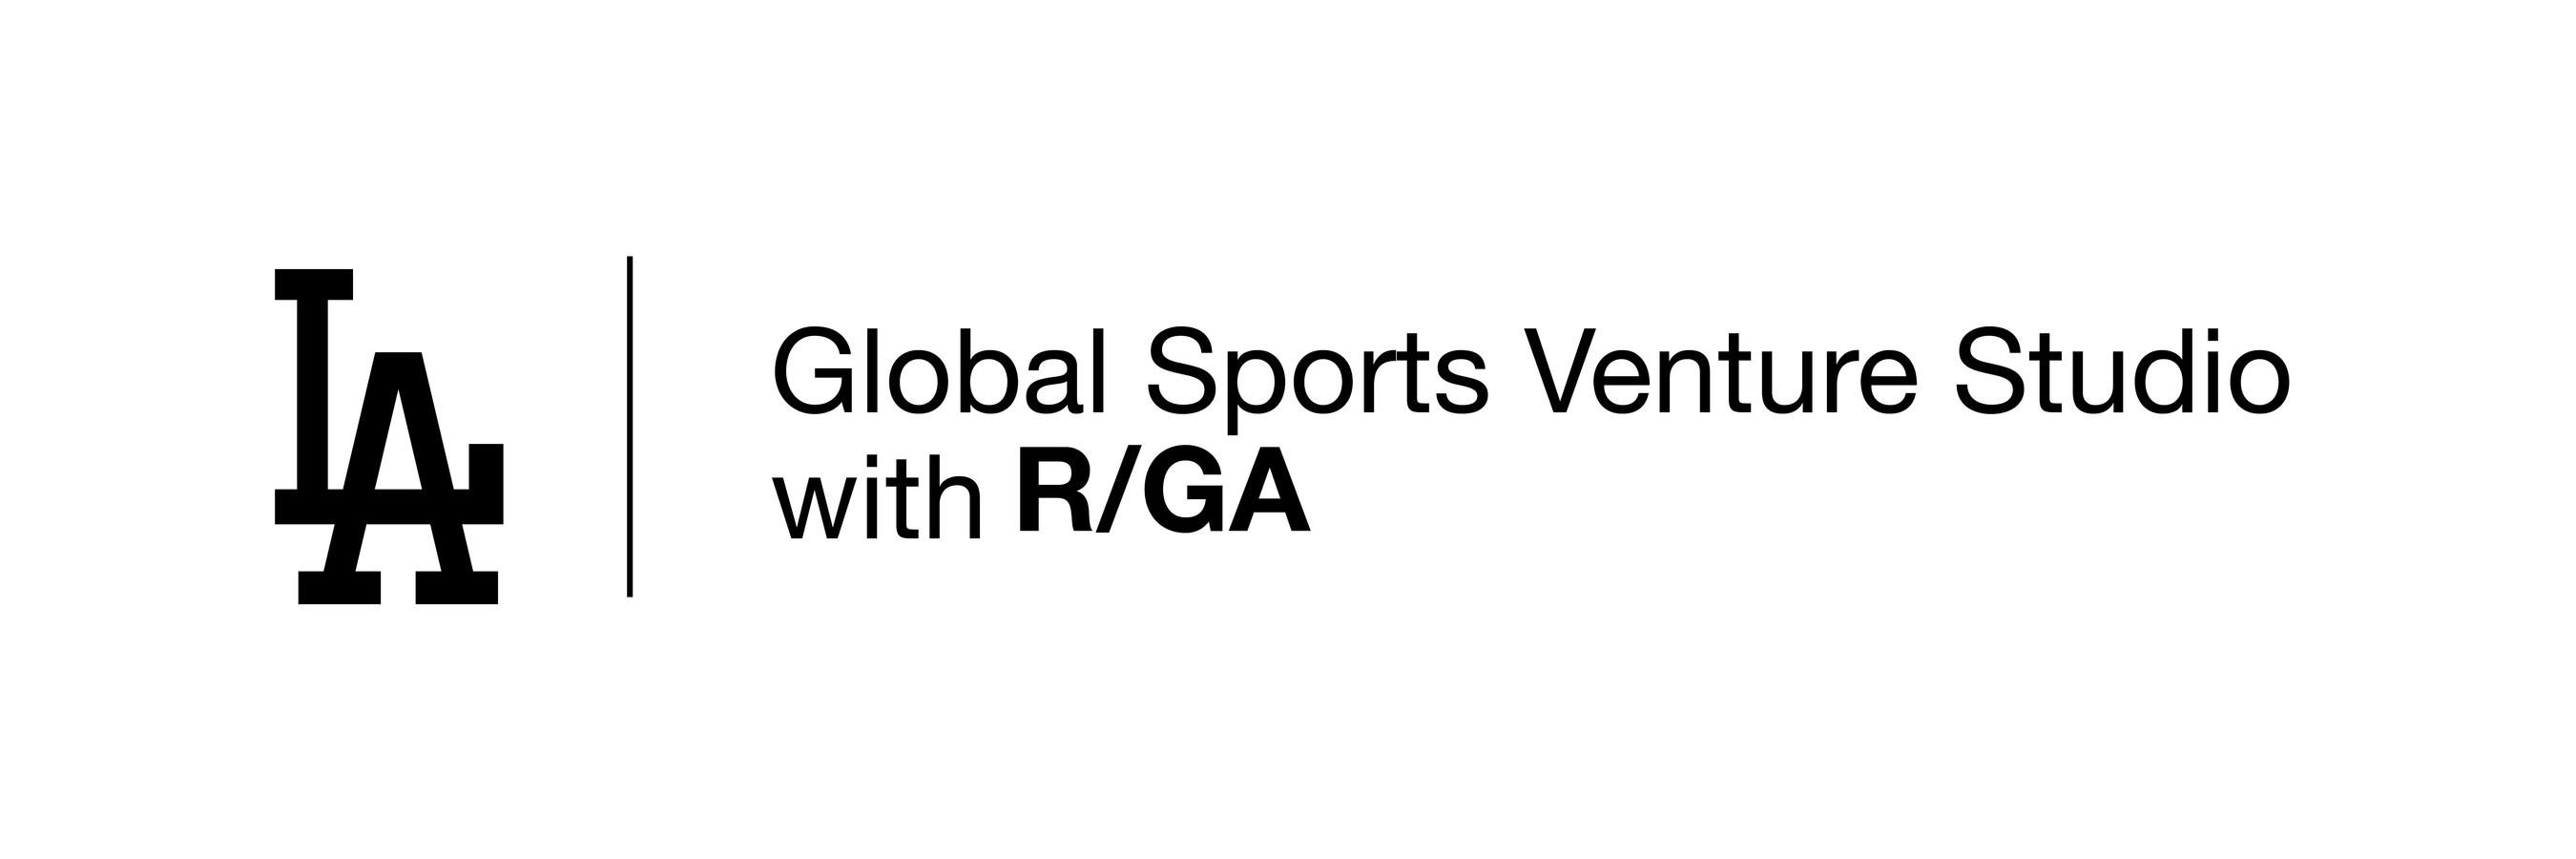 Global Sports Venture Studio logo